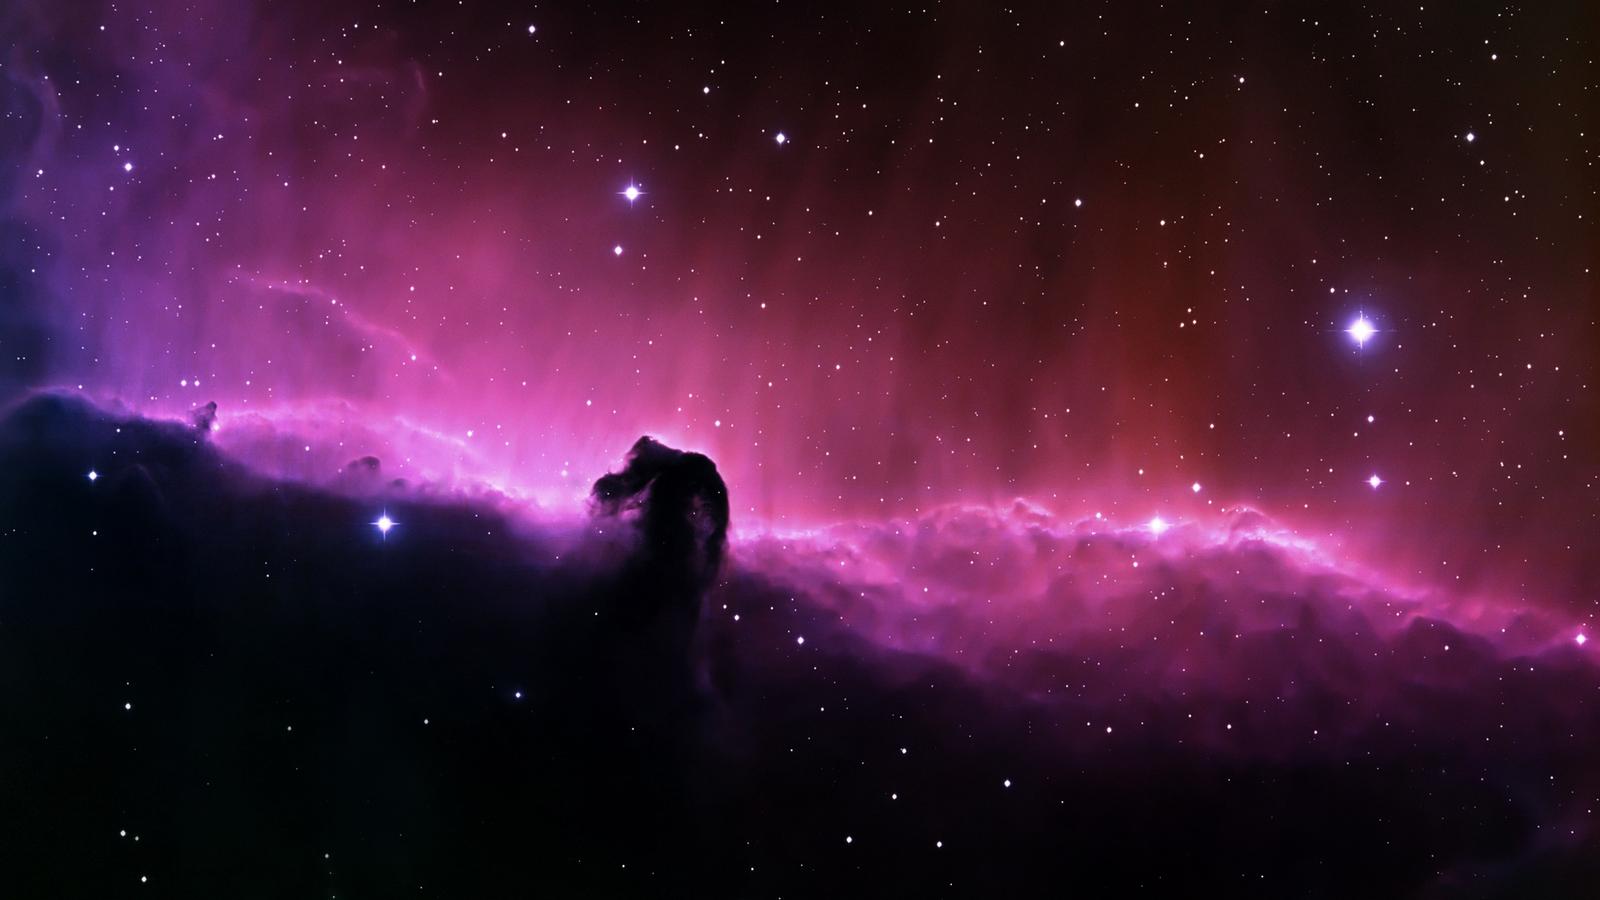 the best top desktop space wallpapers 0n hd space wallpaper horse head 1600x900